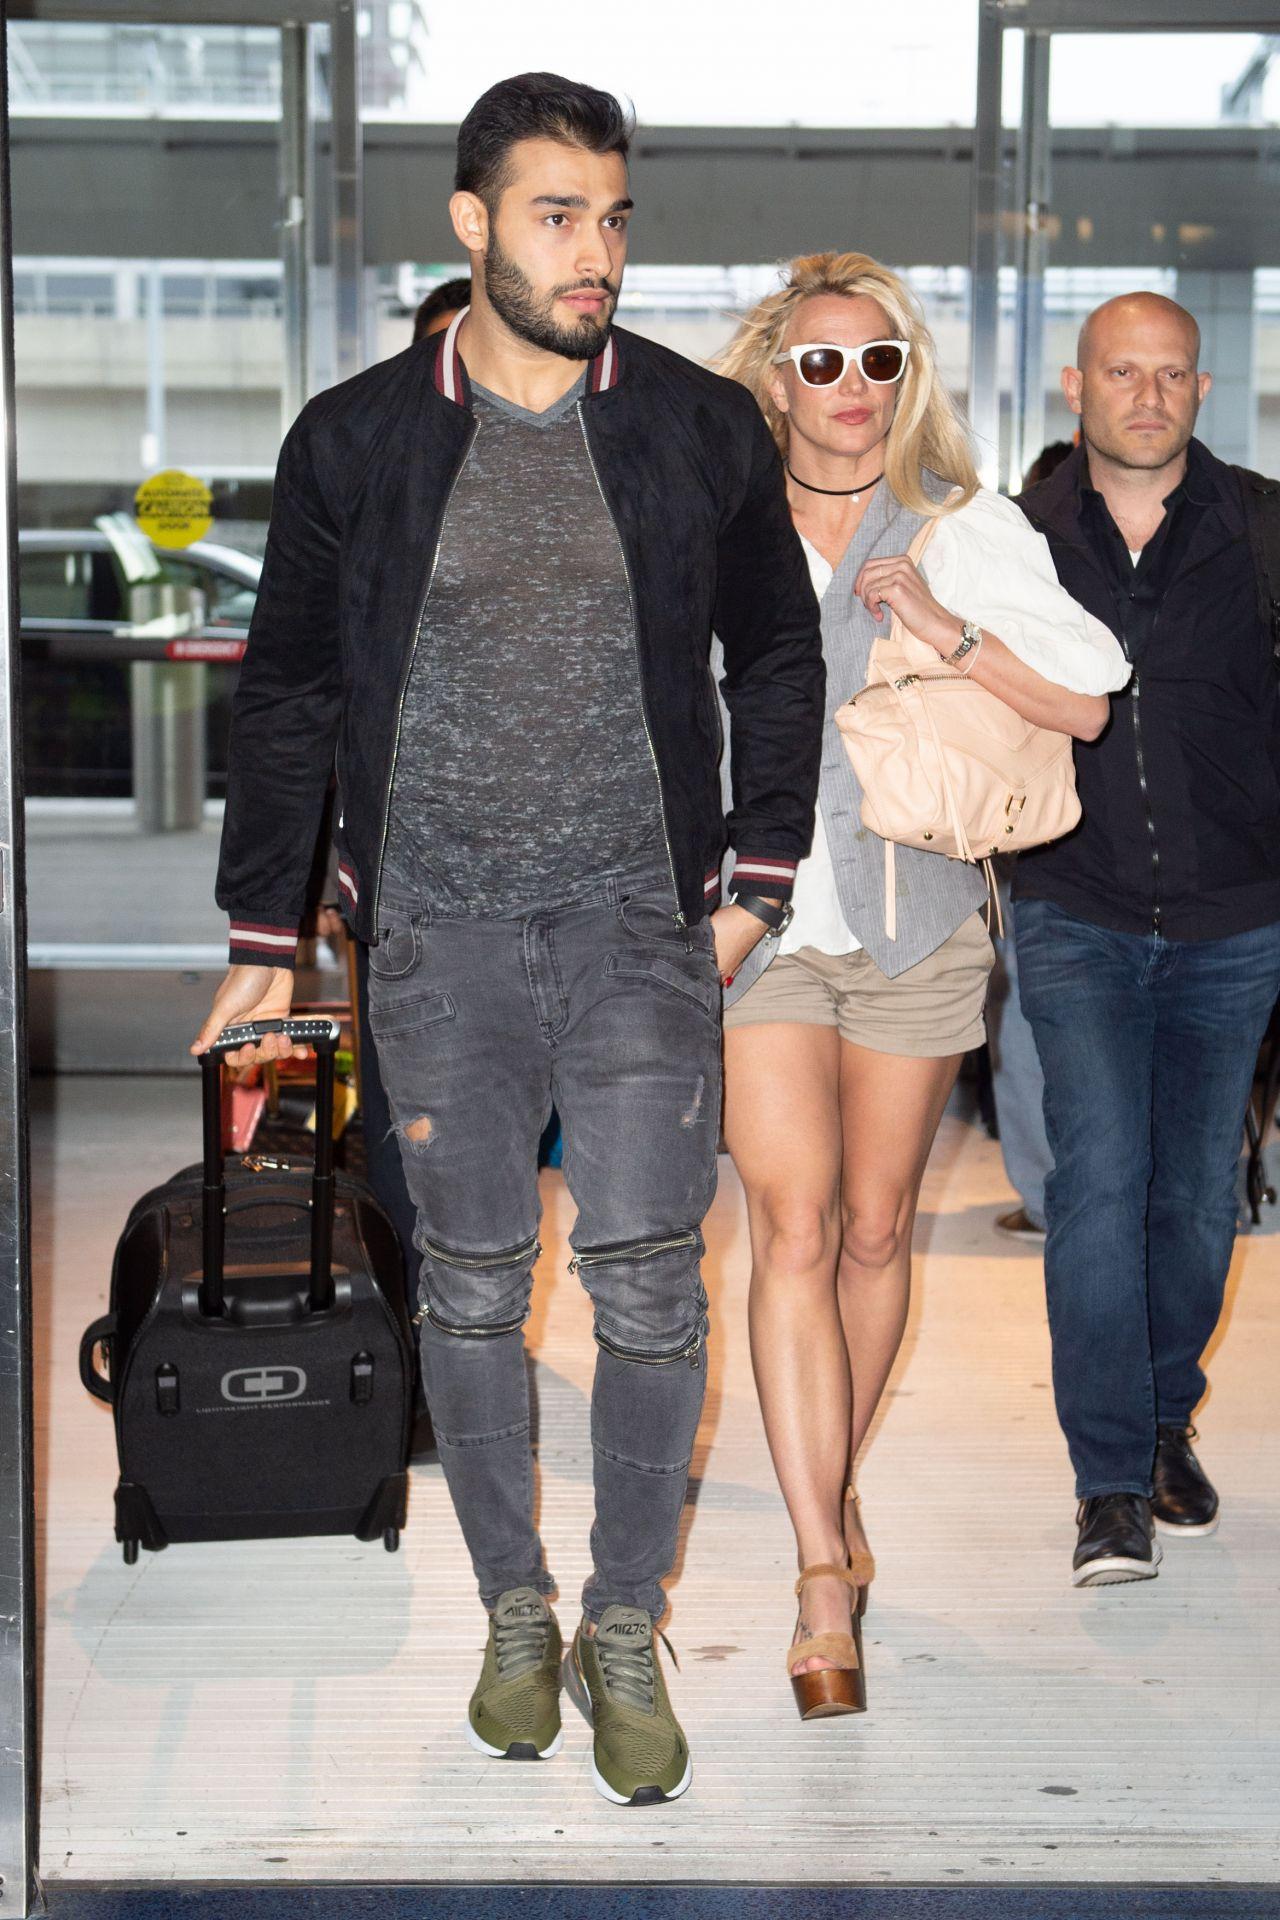 Britney Spears And her boyfriend Sam Asghari seem